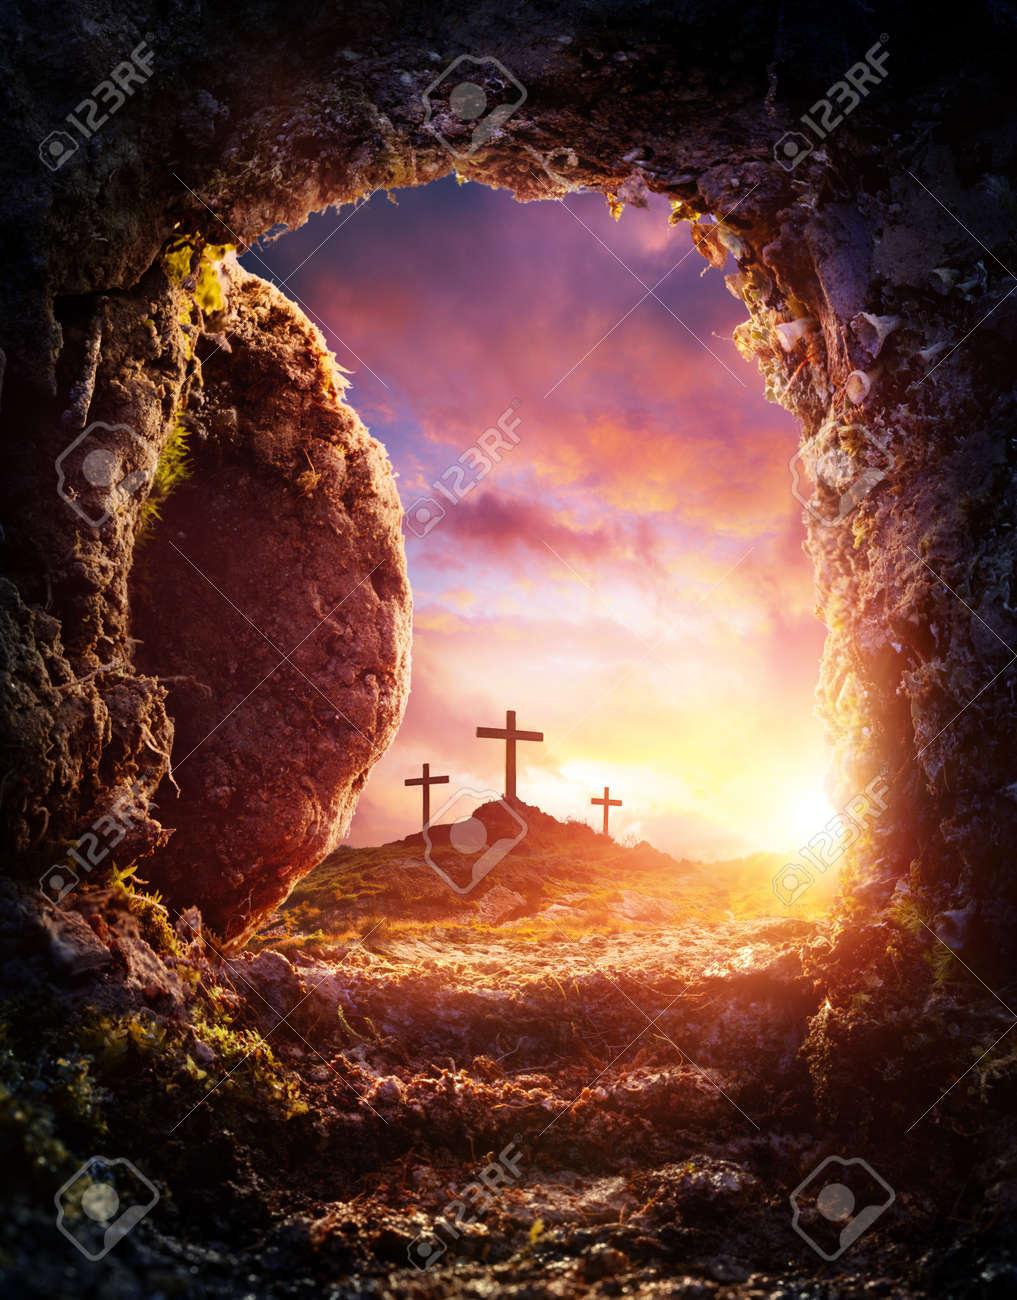 Empty Tomb - Crucifixion And Resurrection Of Jesus Christ - 97199834